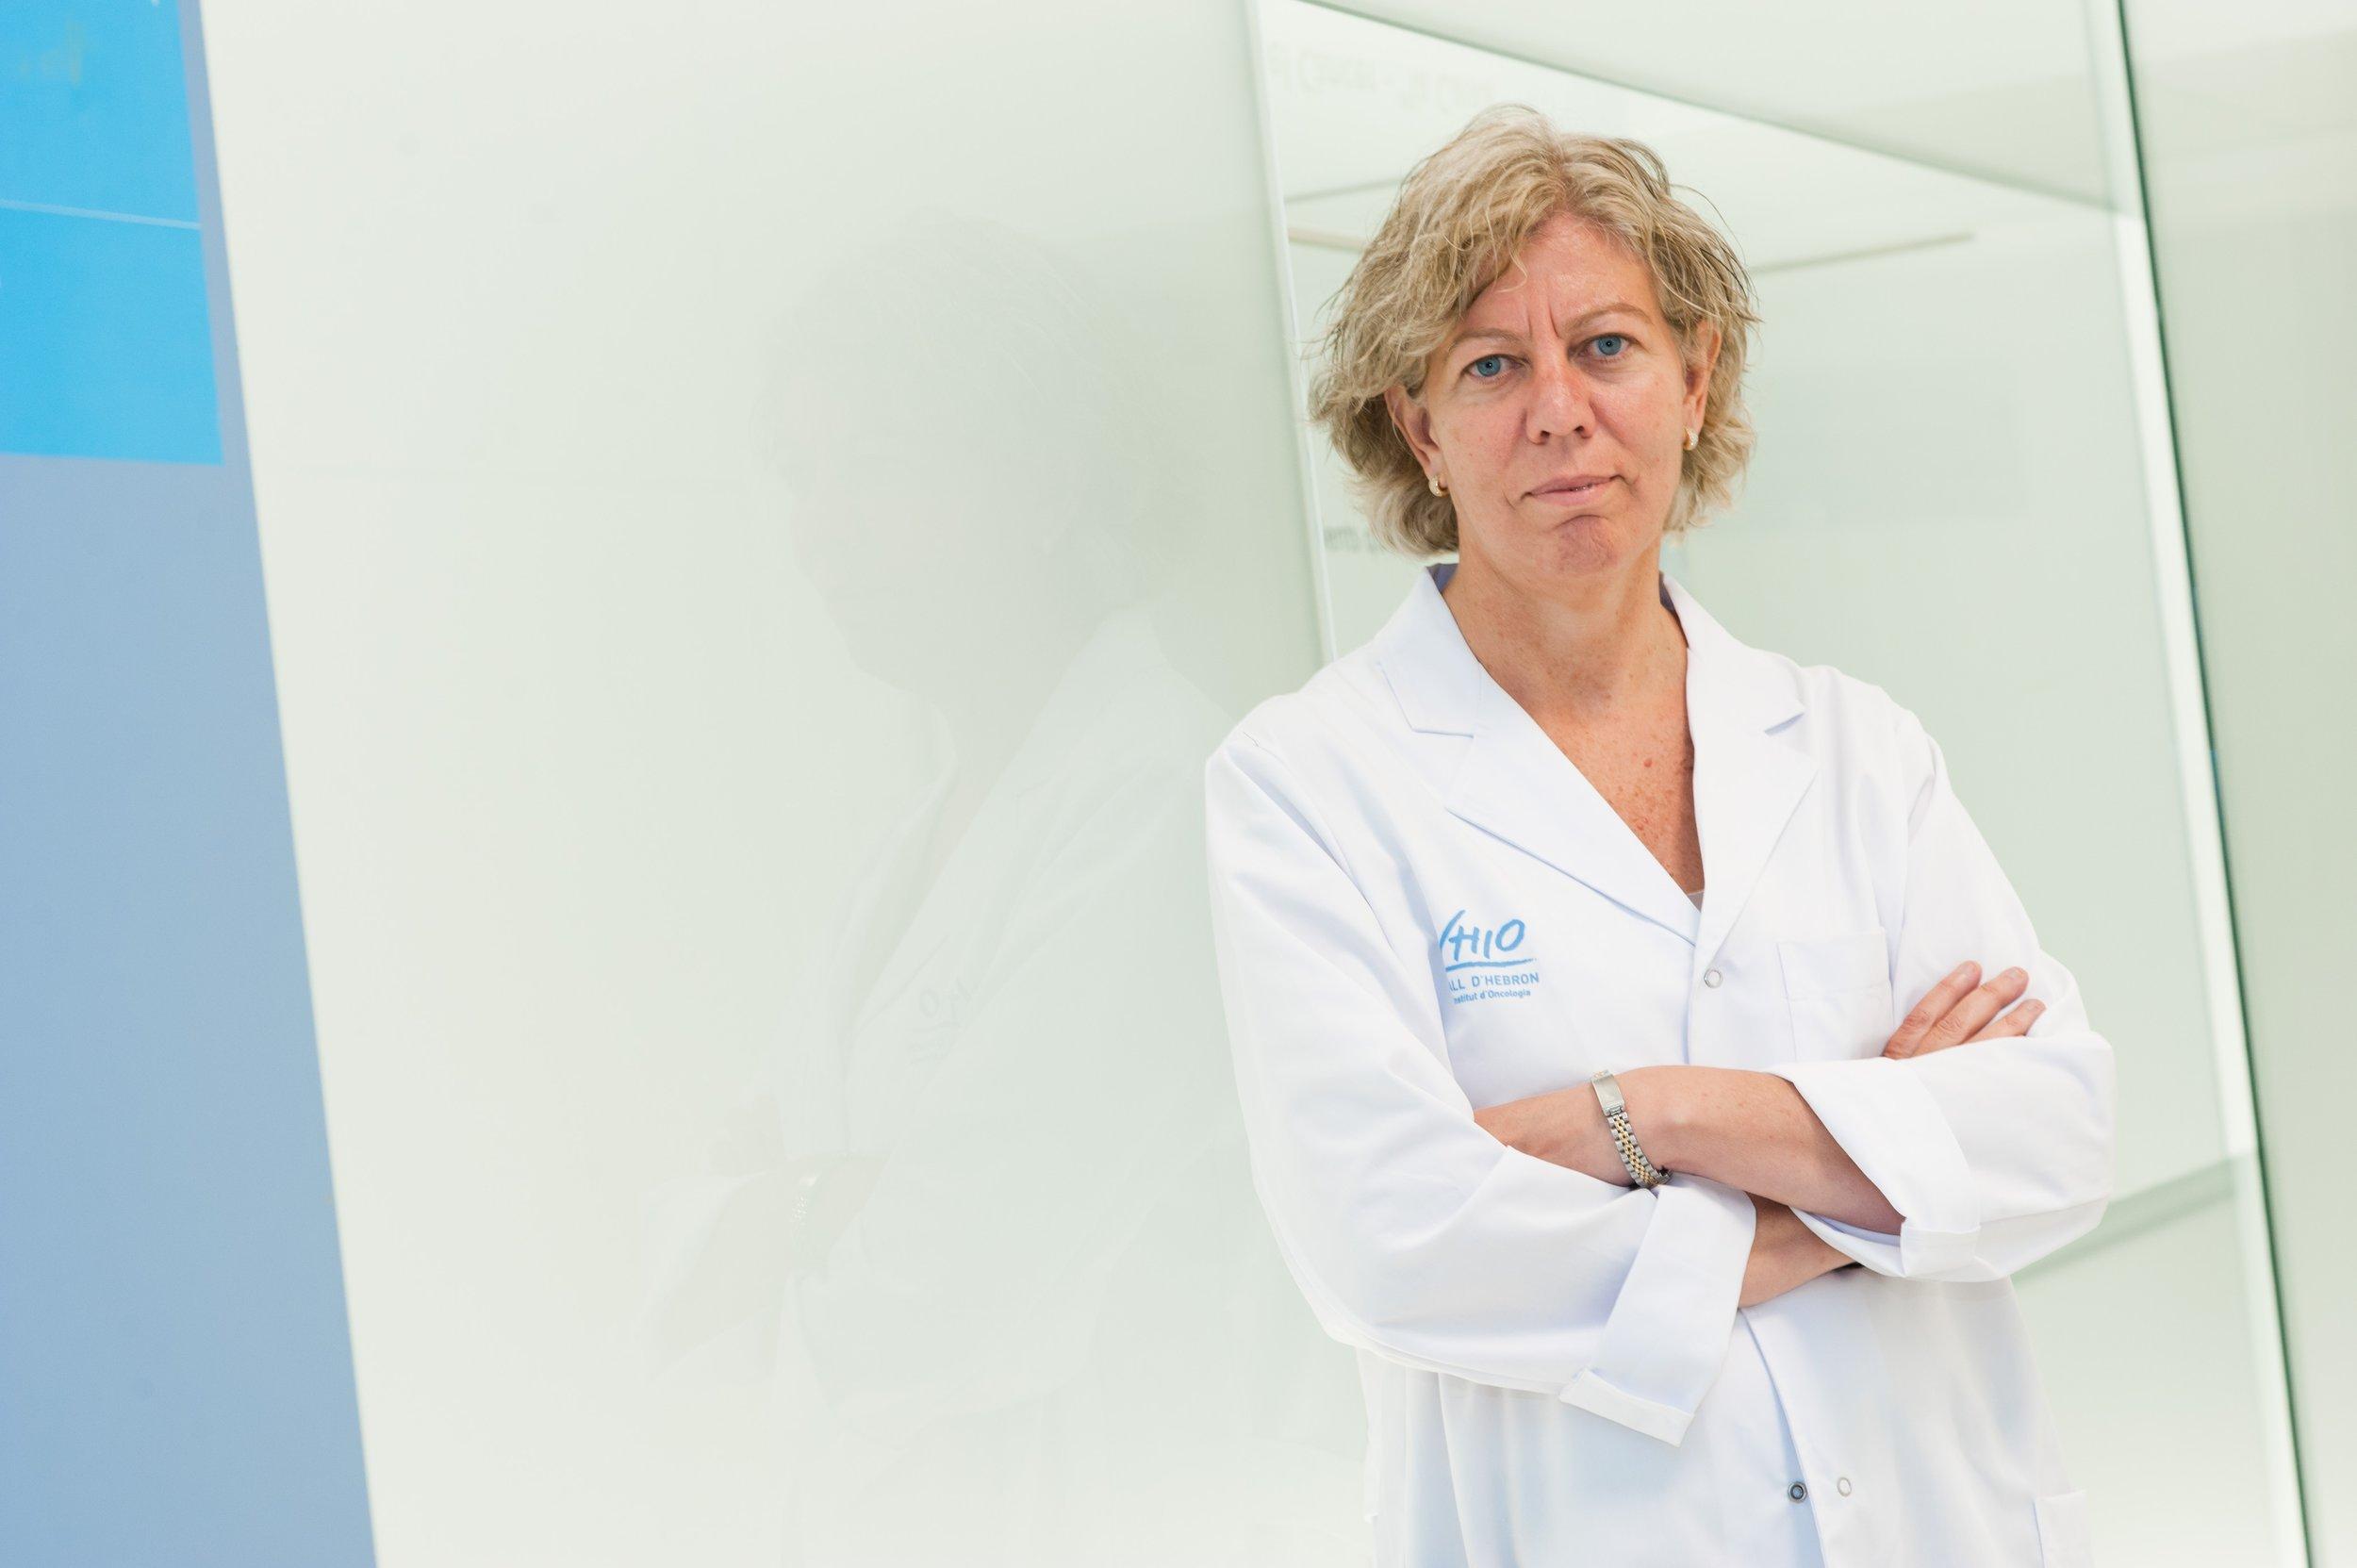 Enriqueta Felip - chemotherapy plus IO